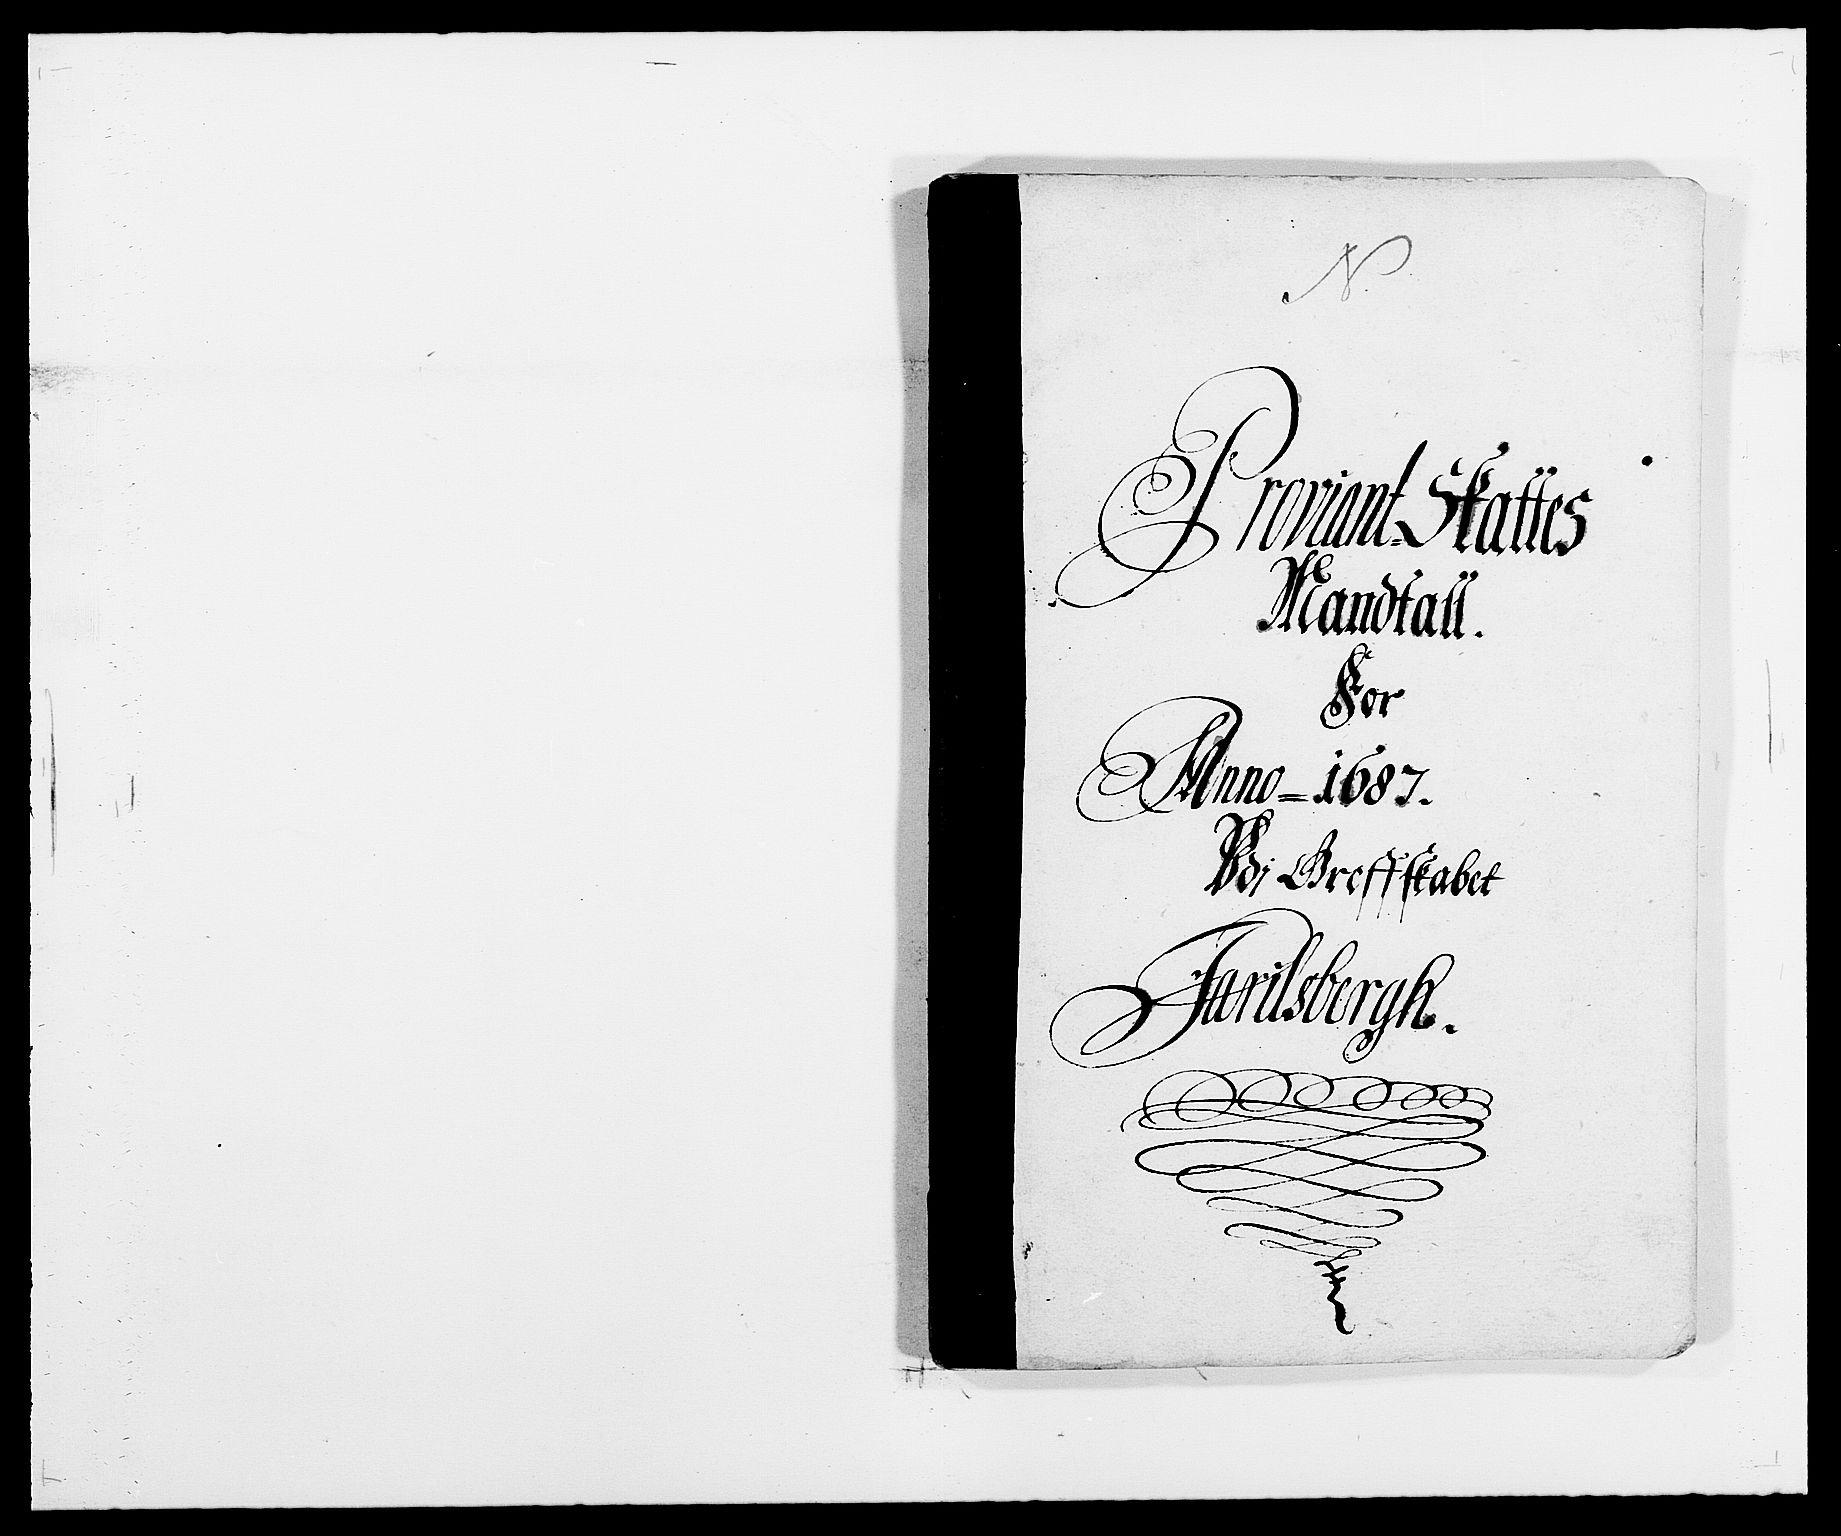 RA, Rentekammeret inntil 1814, Reviderte regnskaper, Fogderegnskap, R32/L1858: Fogderegnskap Jarlsberg grevskap, 1686-1690, s. 86